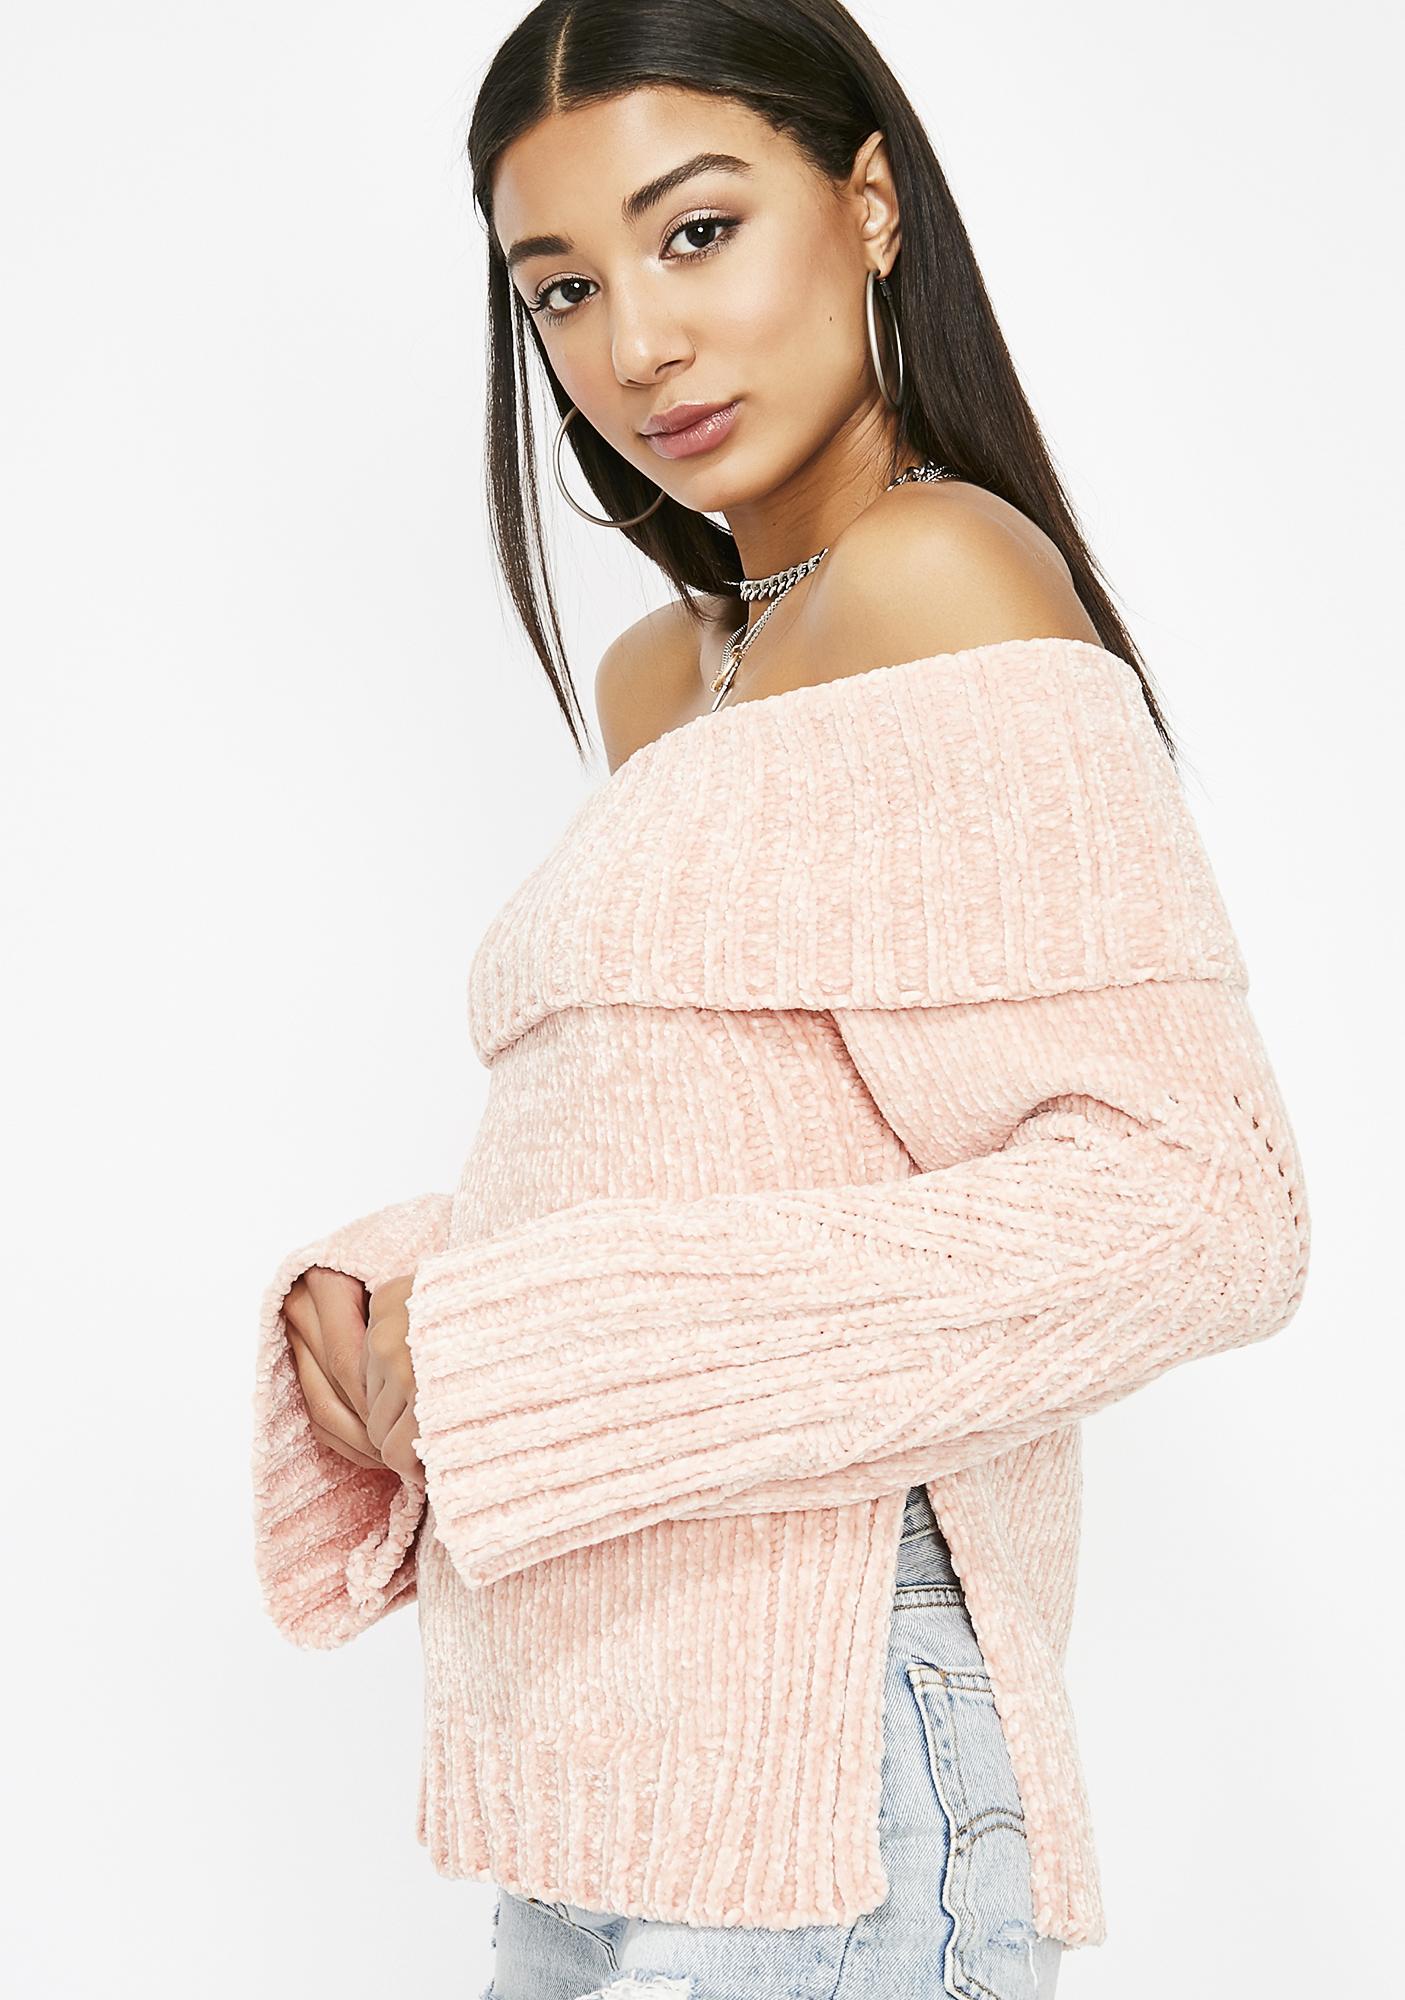 Pixie Cool Kidz Chenille Sweater